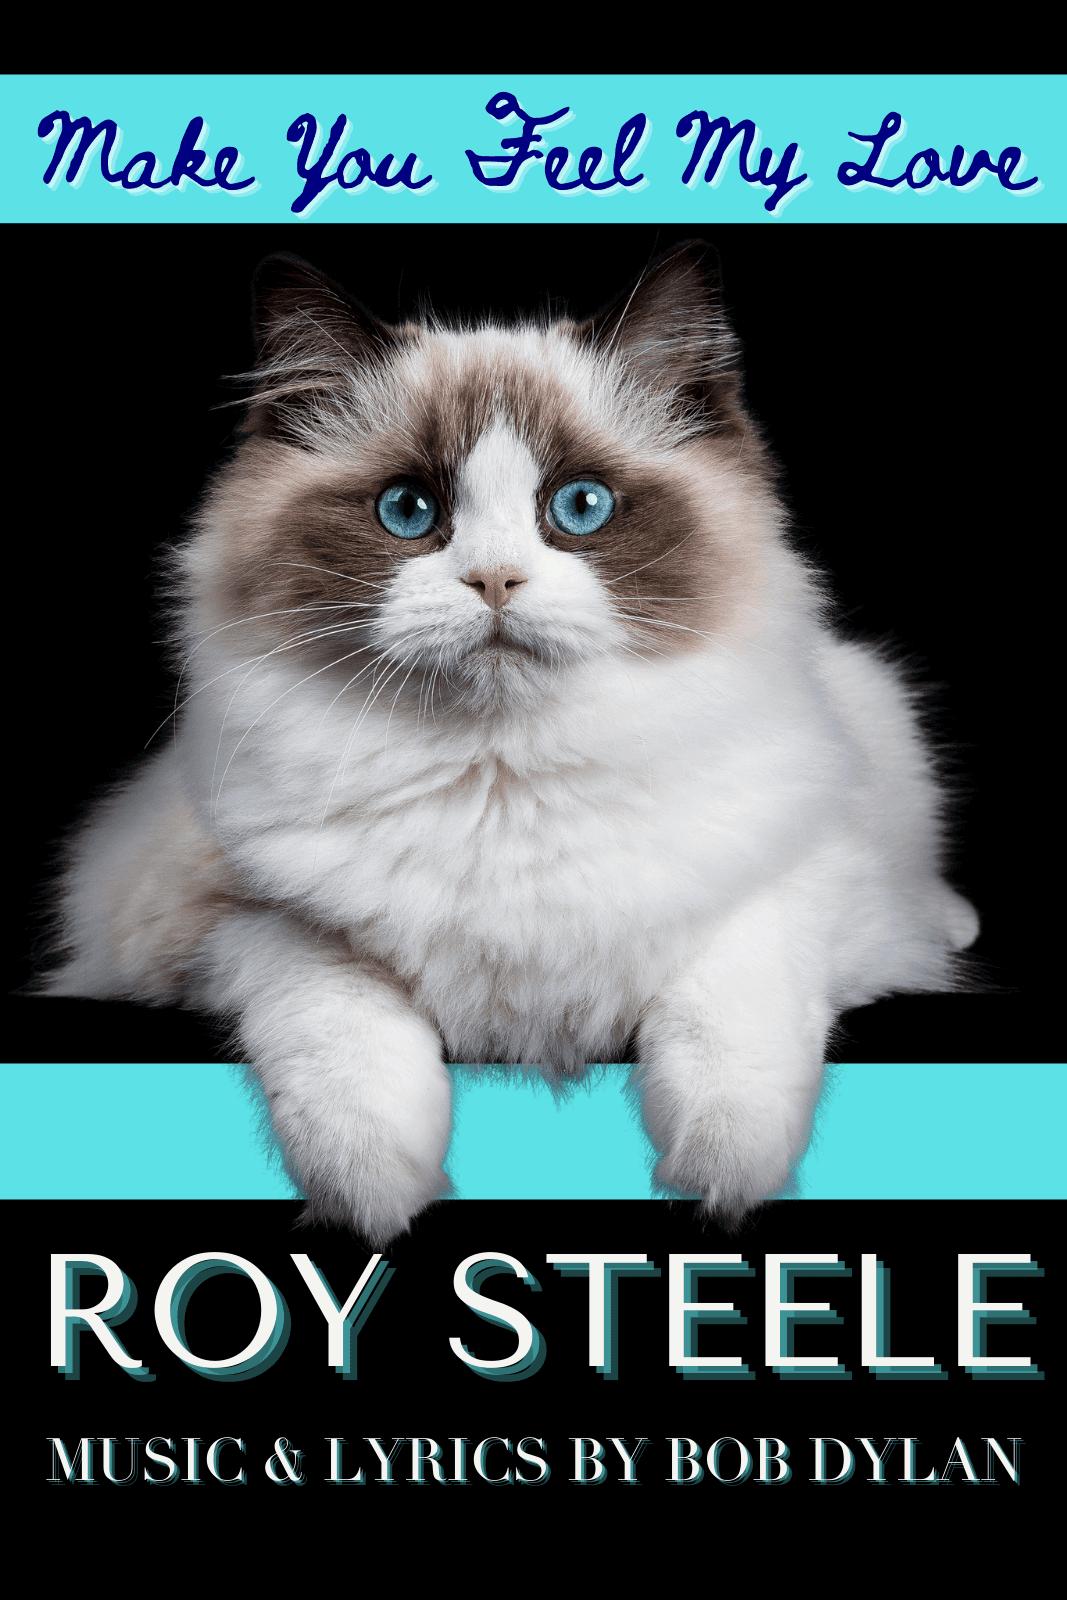 Roy Steele: Make You Feel My Love